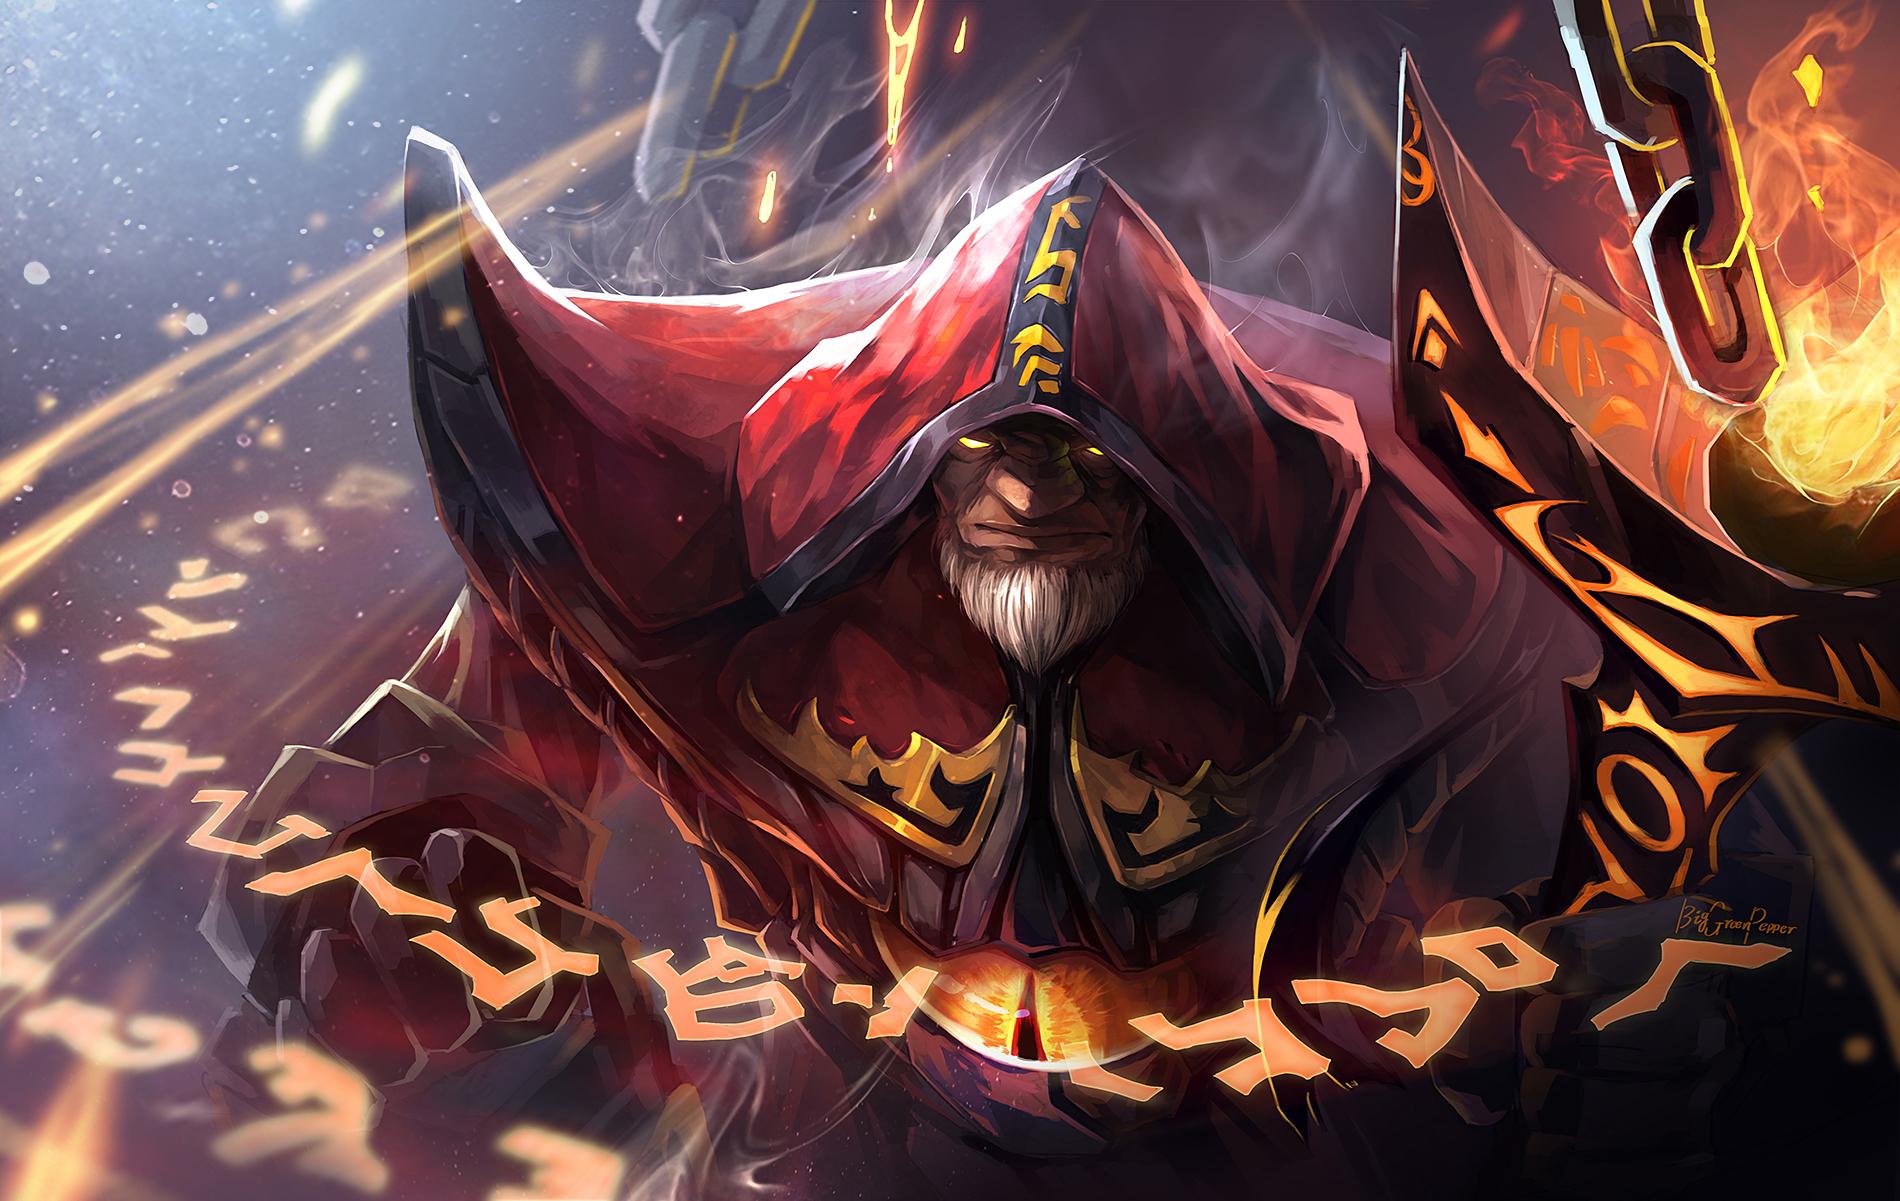 Warlocks Dragons: Dota2 The Warlock By Biggreenpepper On DeviantArt